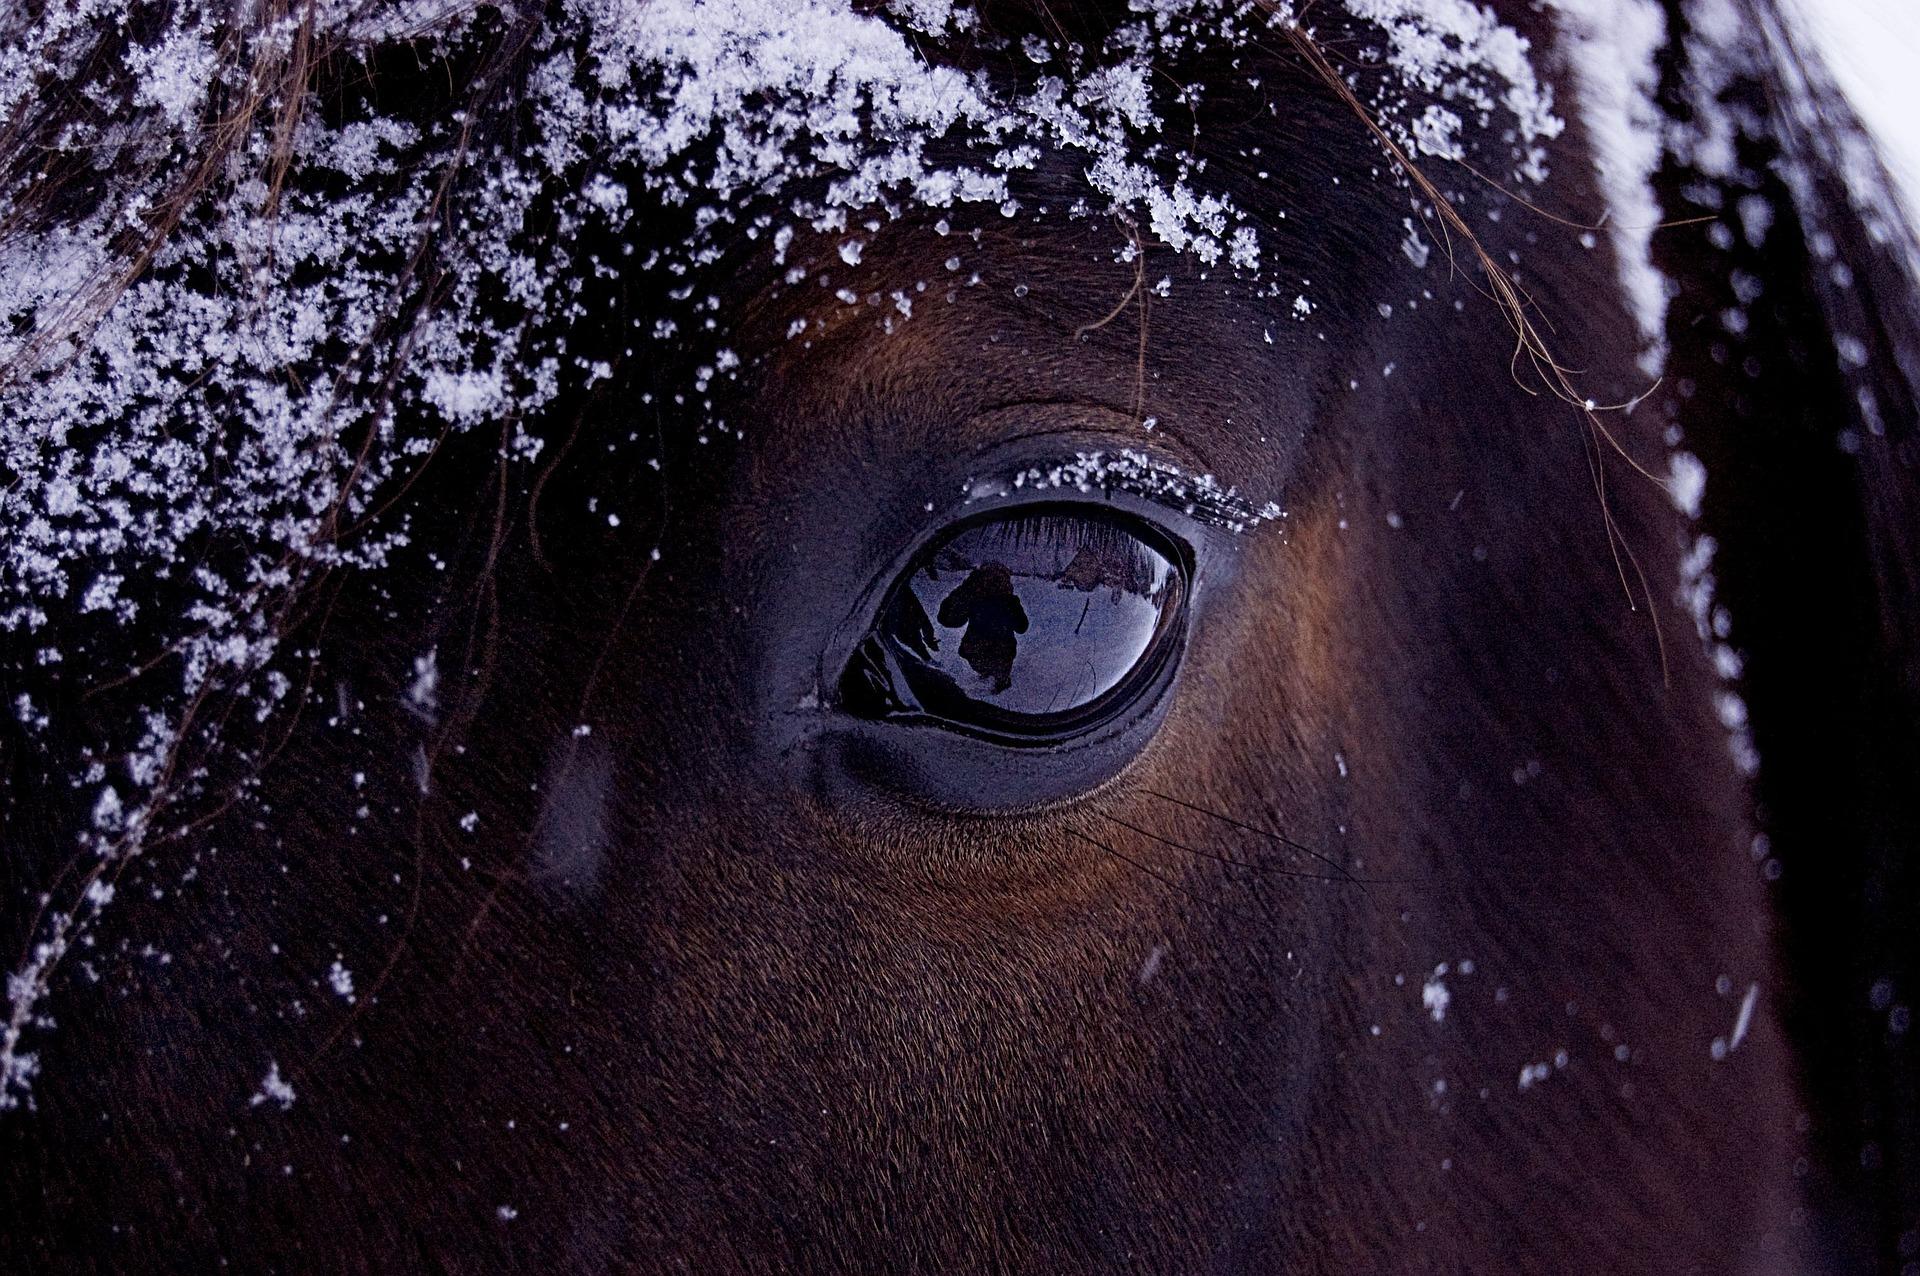 horse-743474_1920